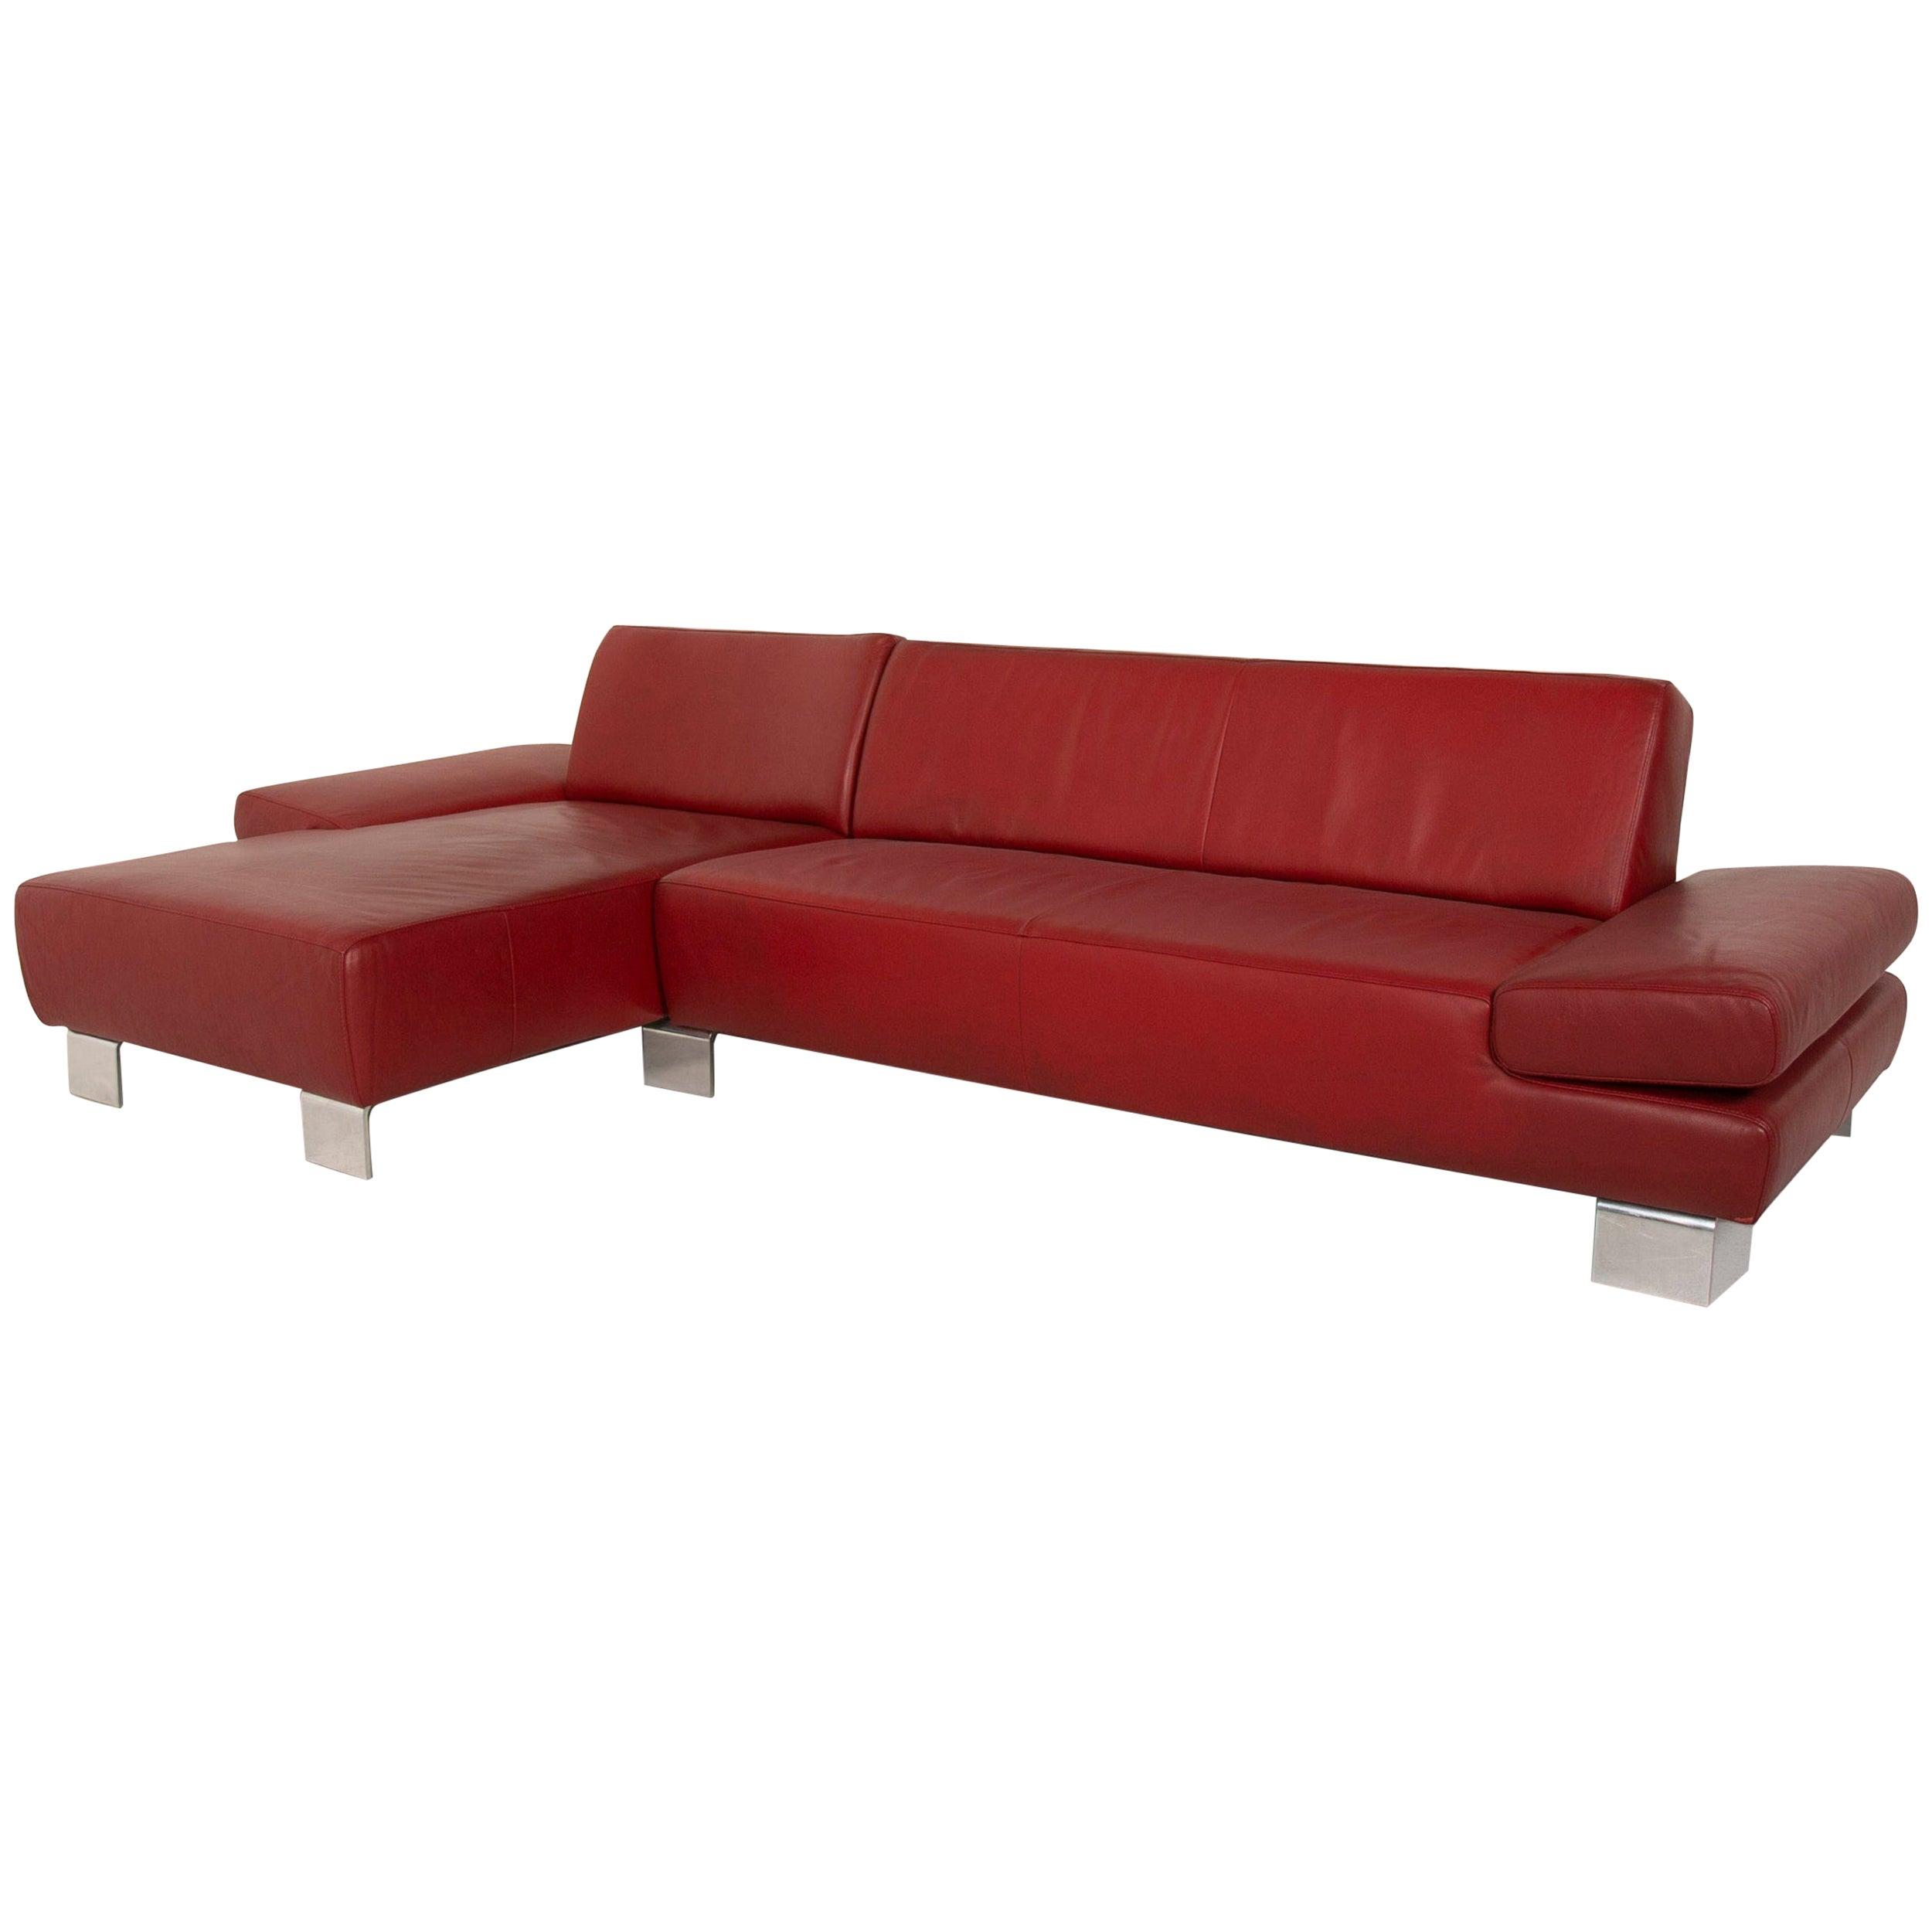 Willi Schillig Leather Sofa Red Corner Sofa